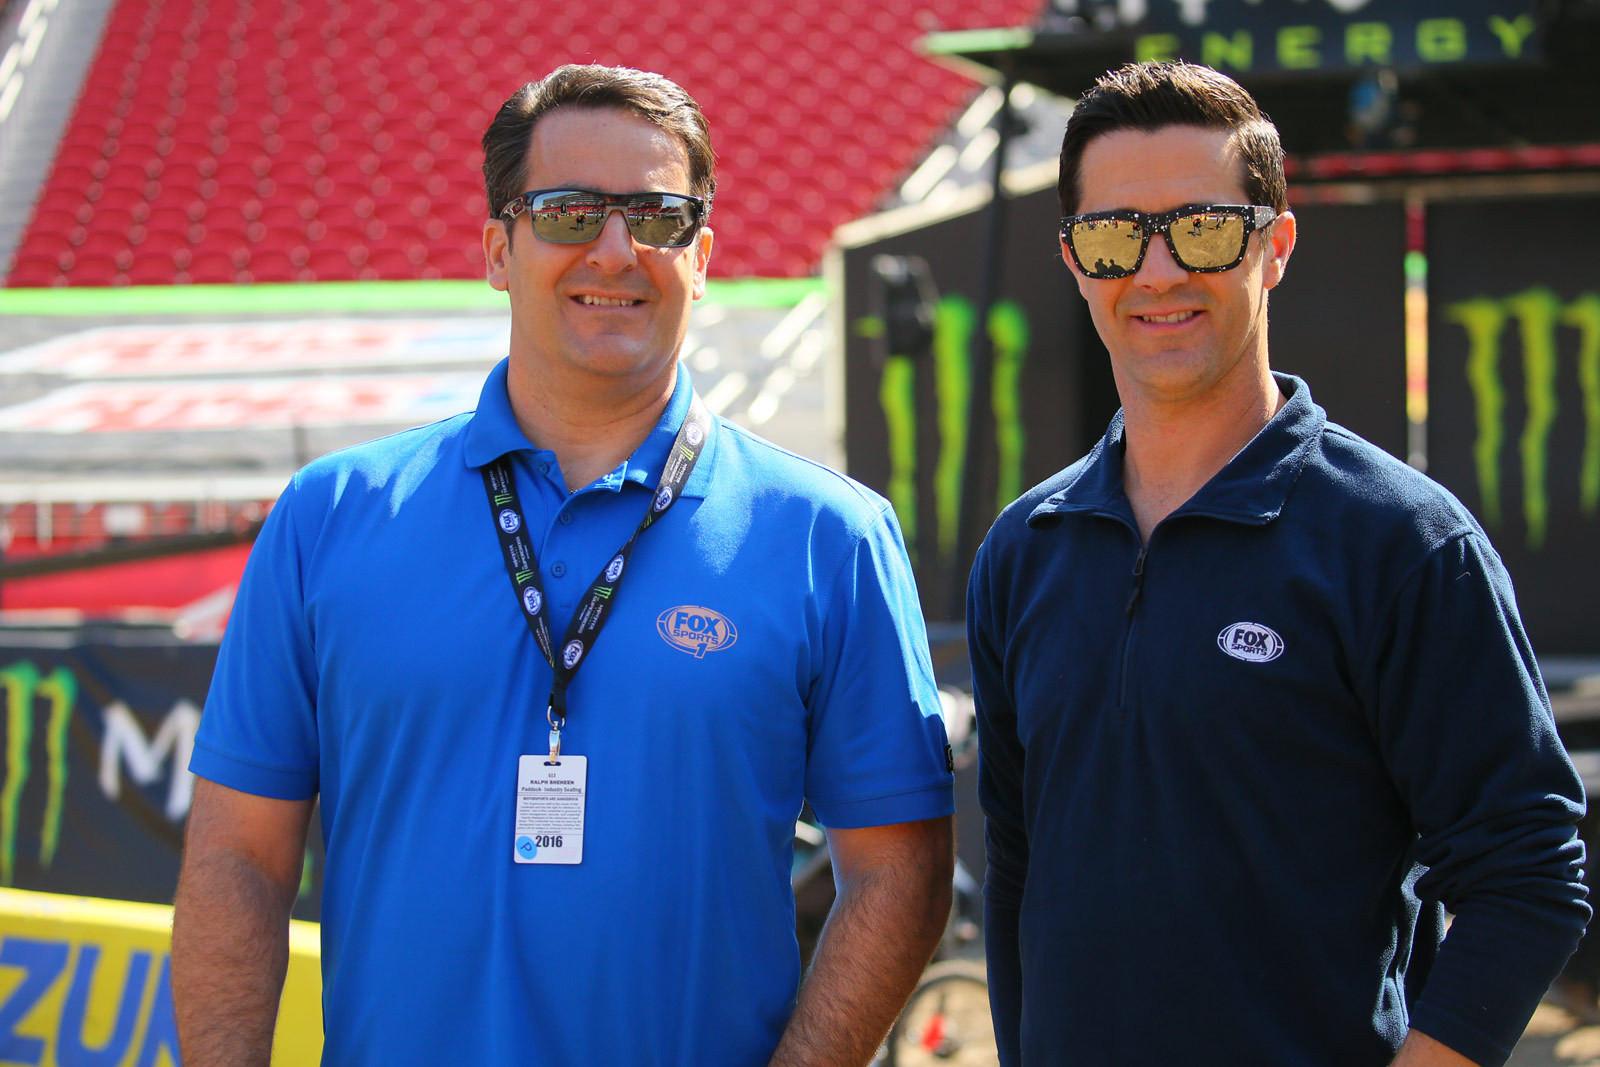 Ralph Sheheen and Jeff Emig - Pit Bits: Santa Clara - Motocross Pictures - Vital MX